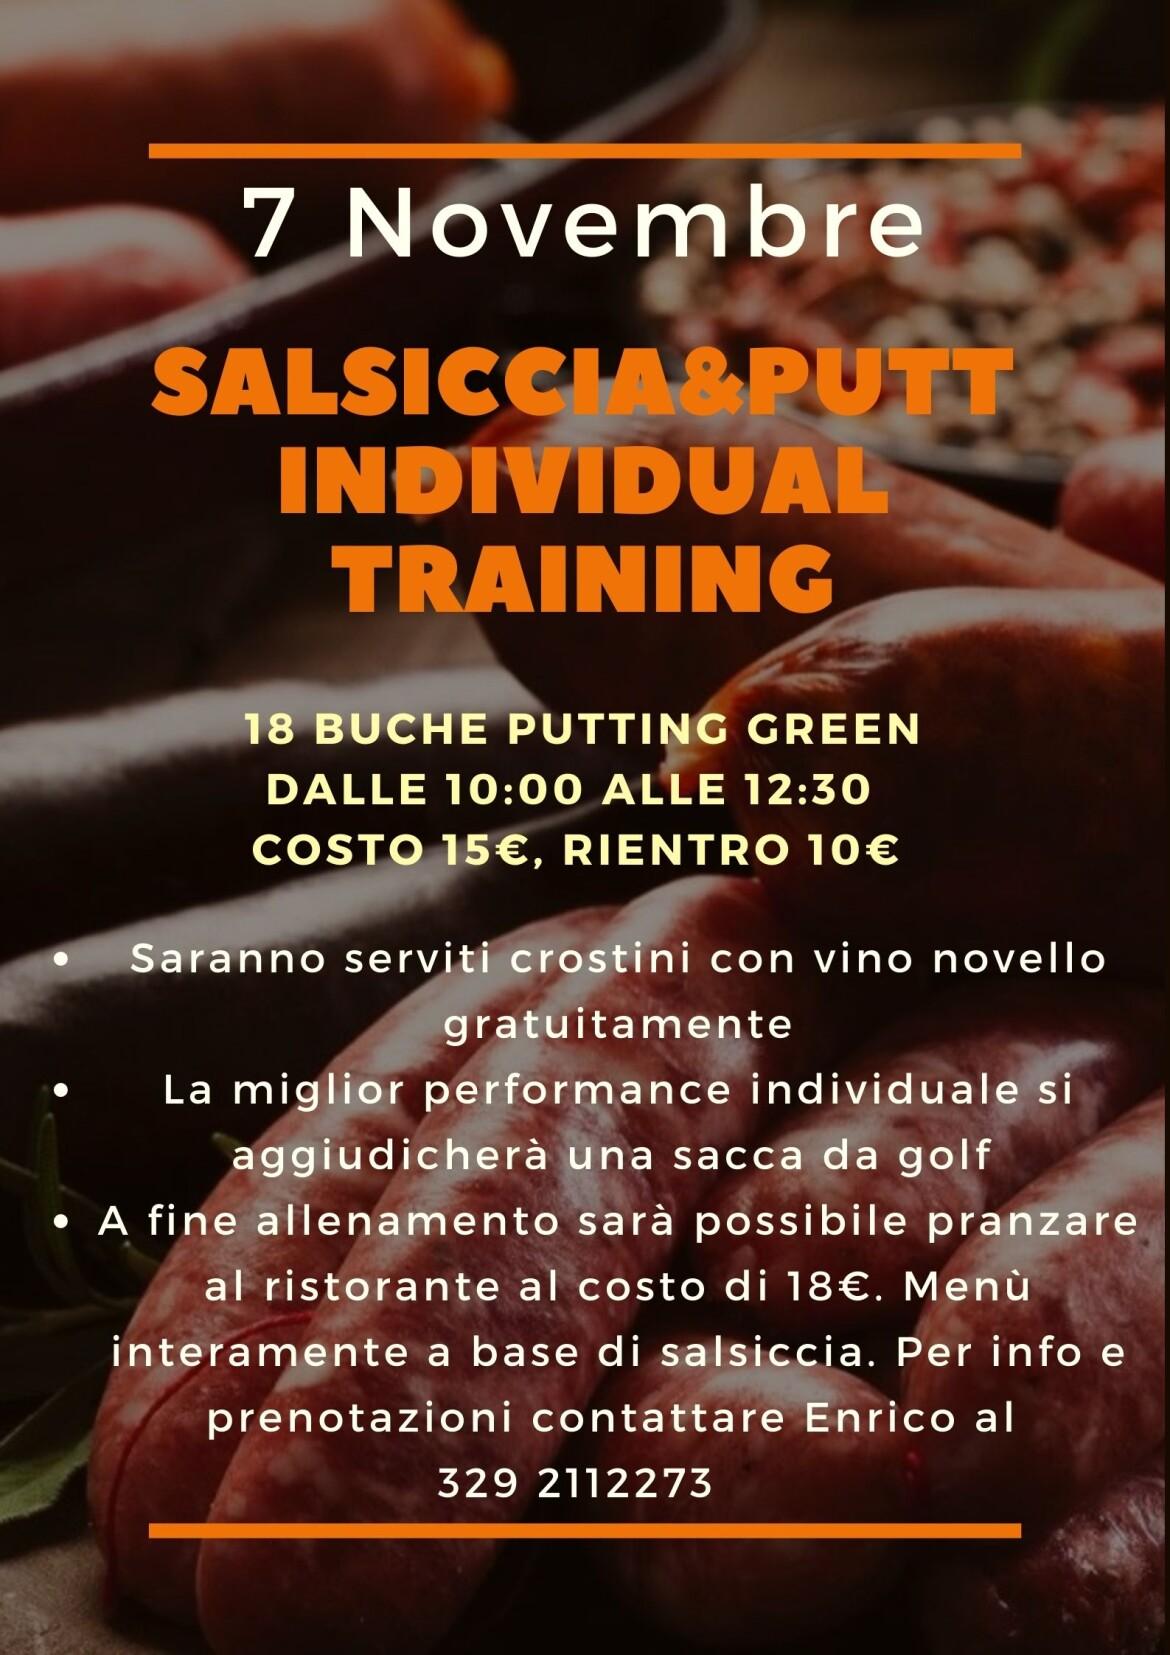 SALSICCIA&PUTT INDIVIDUAL TRAINING